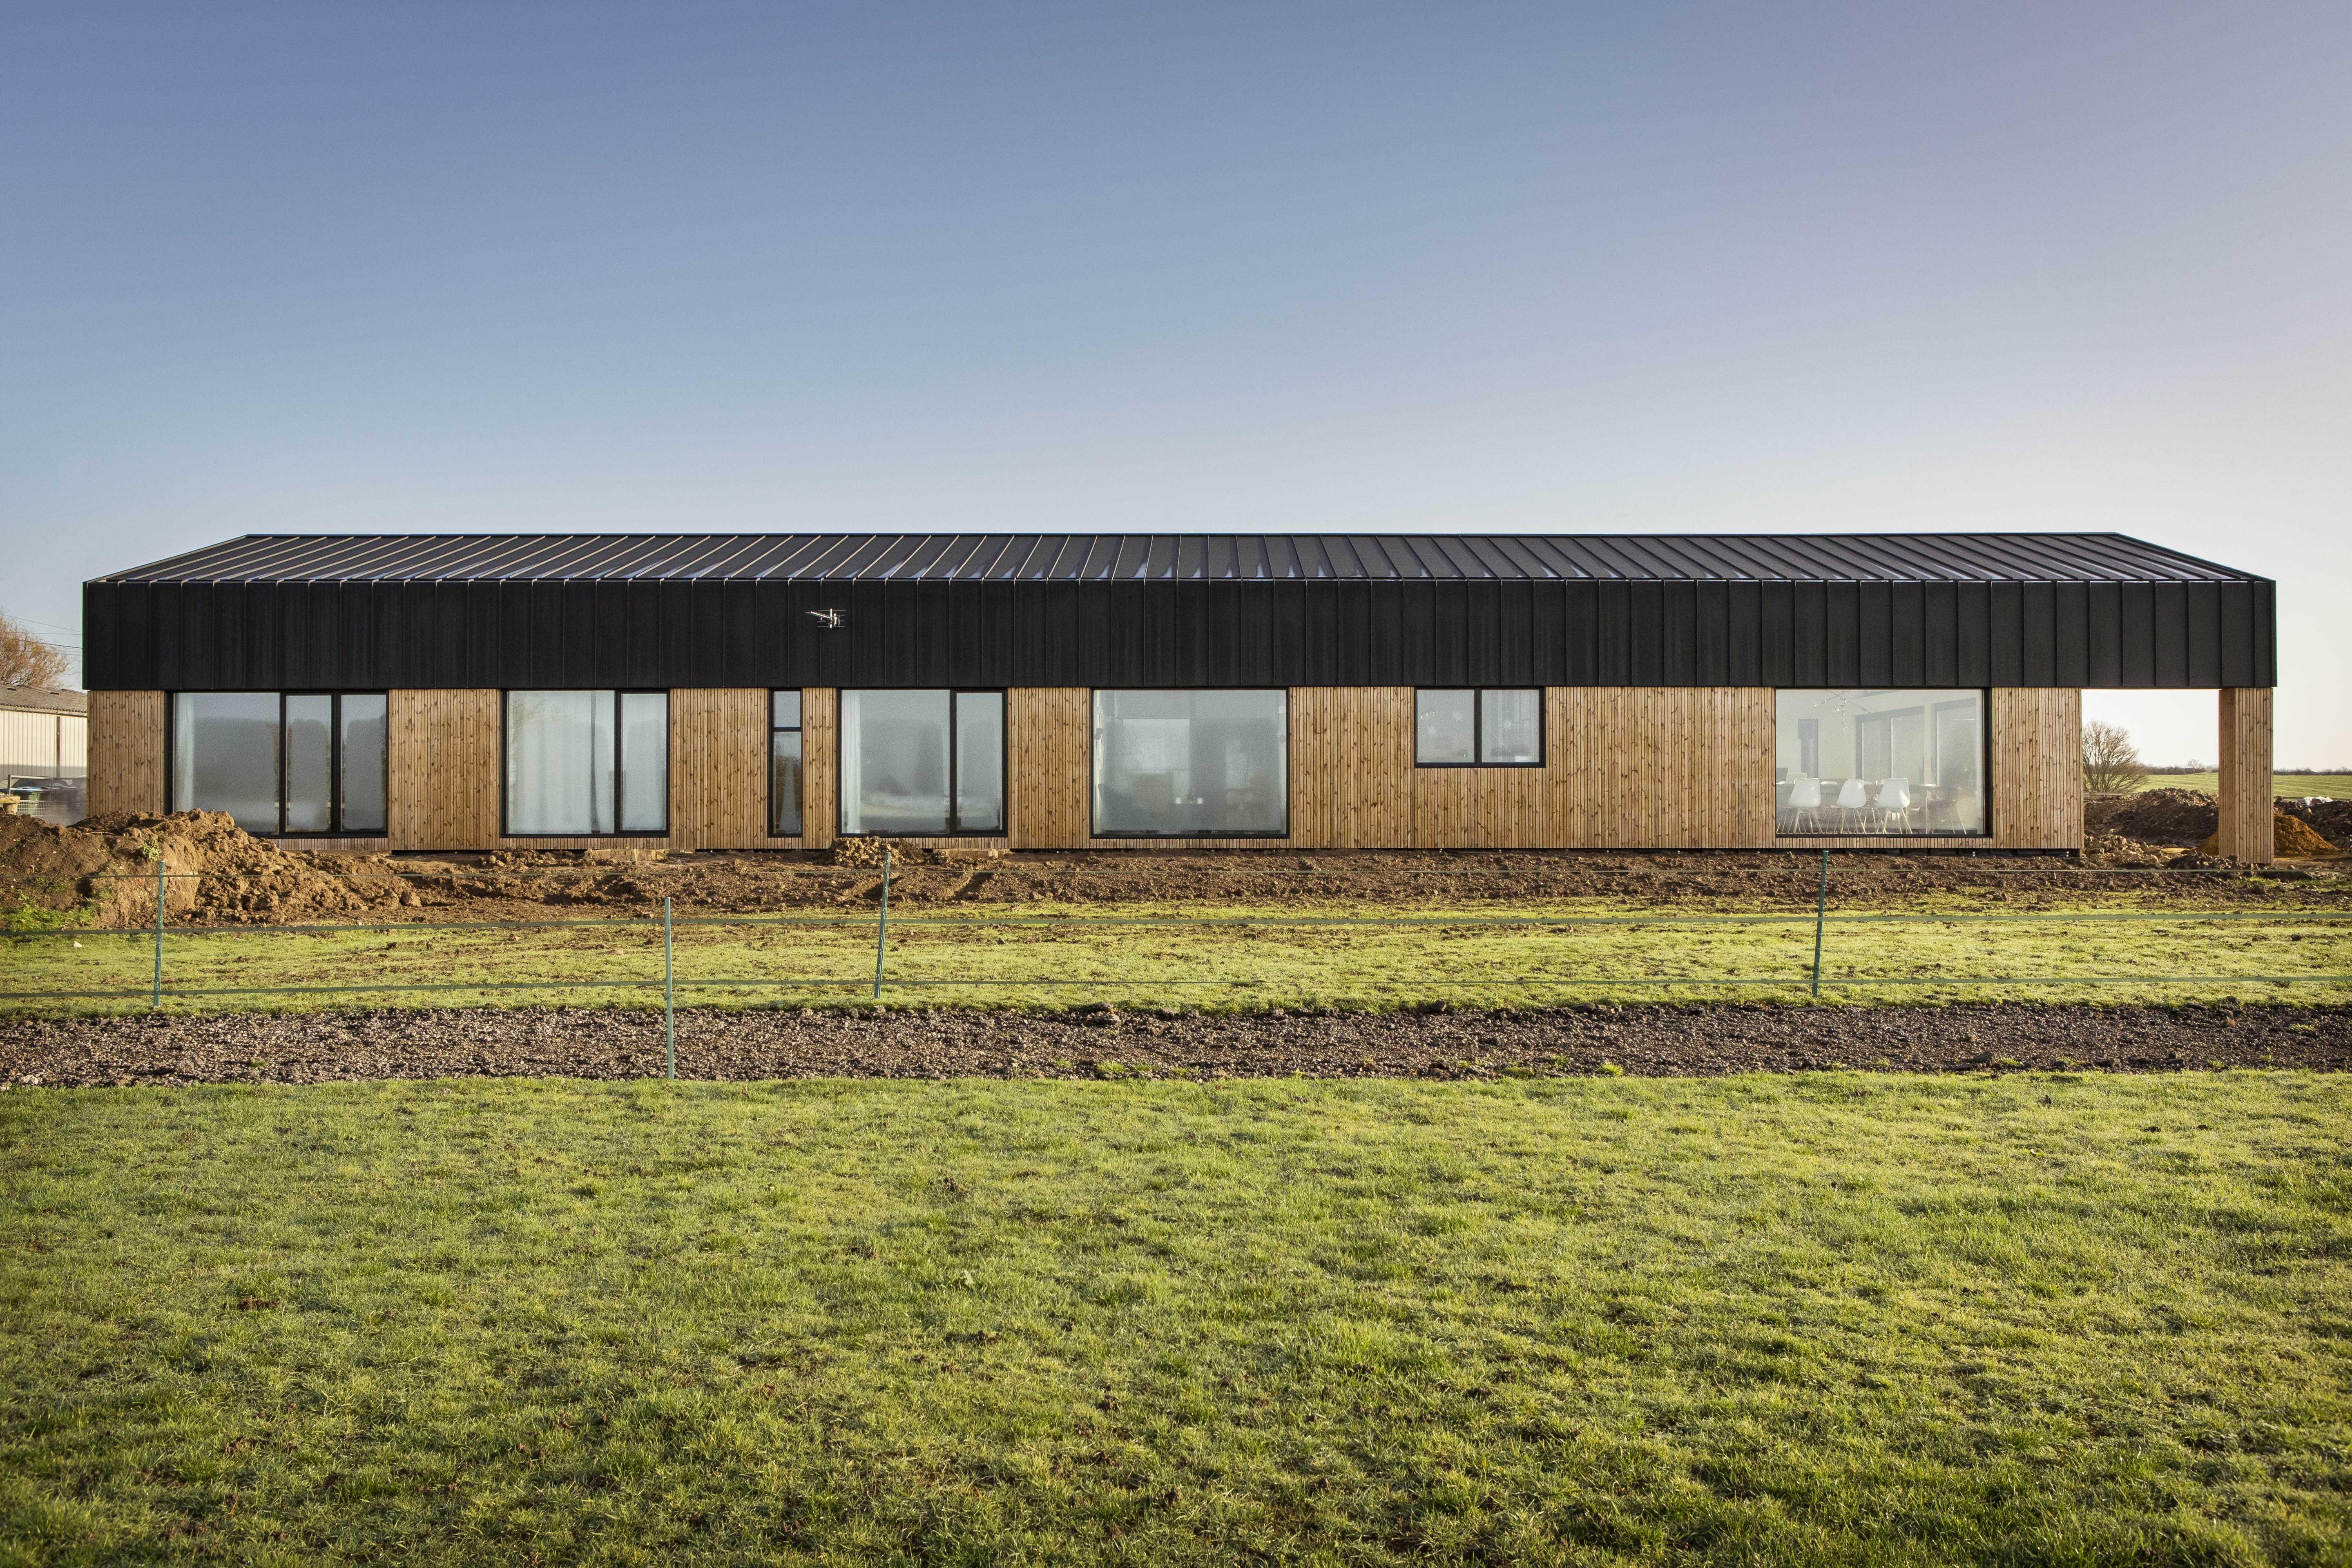 Aylesbury barn conversion - exterior